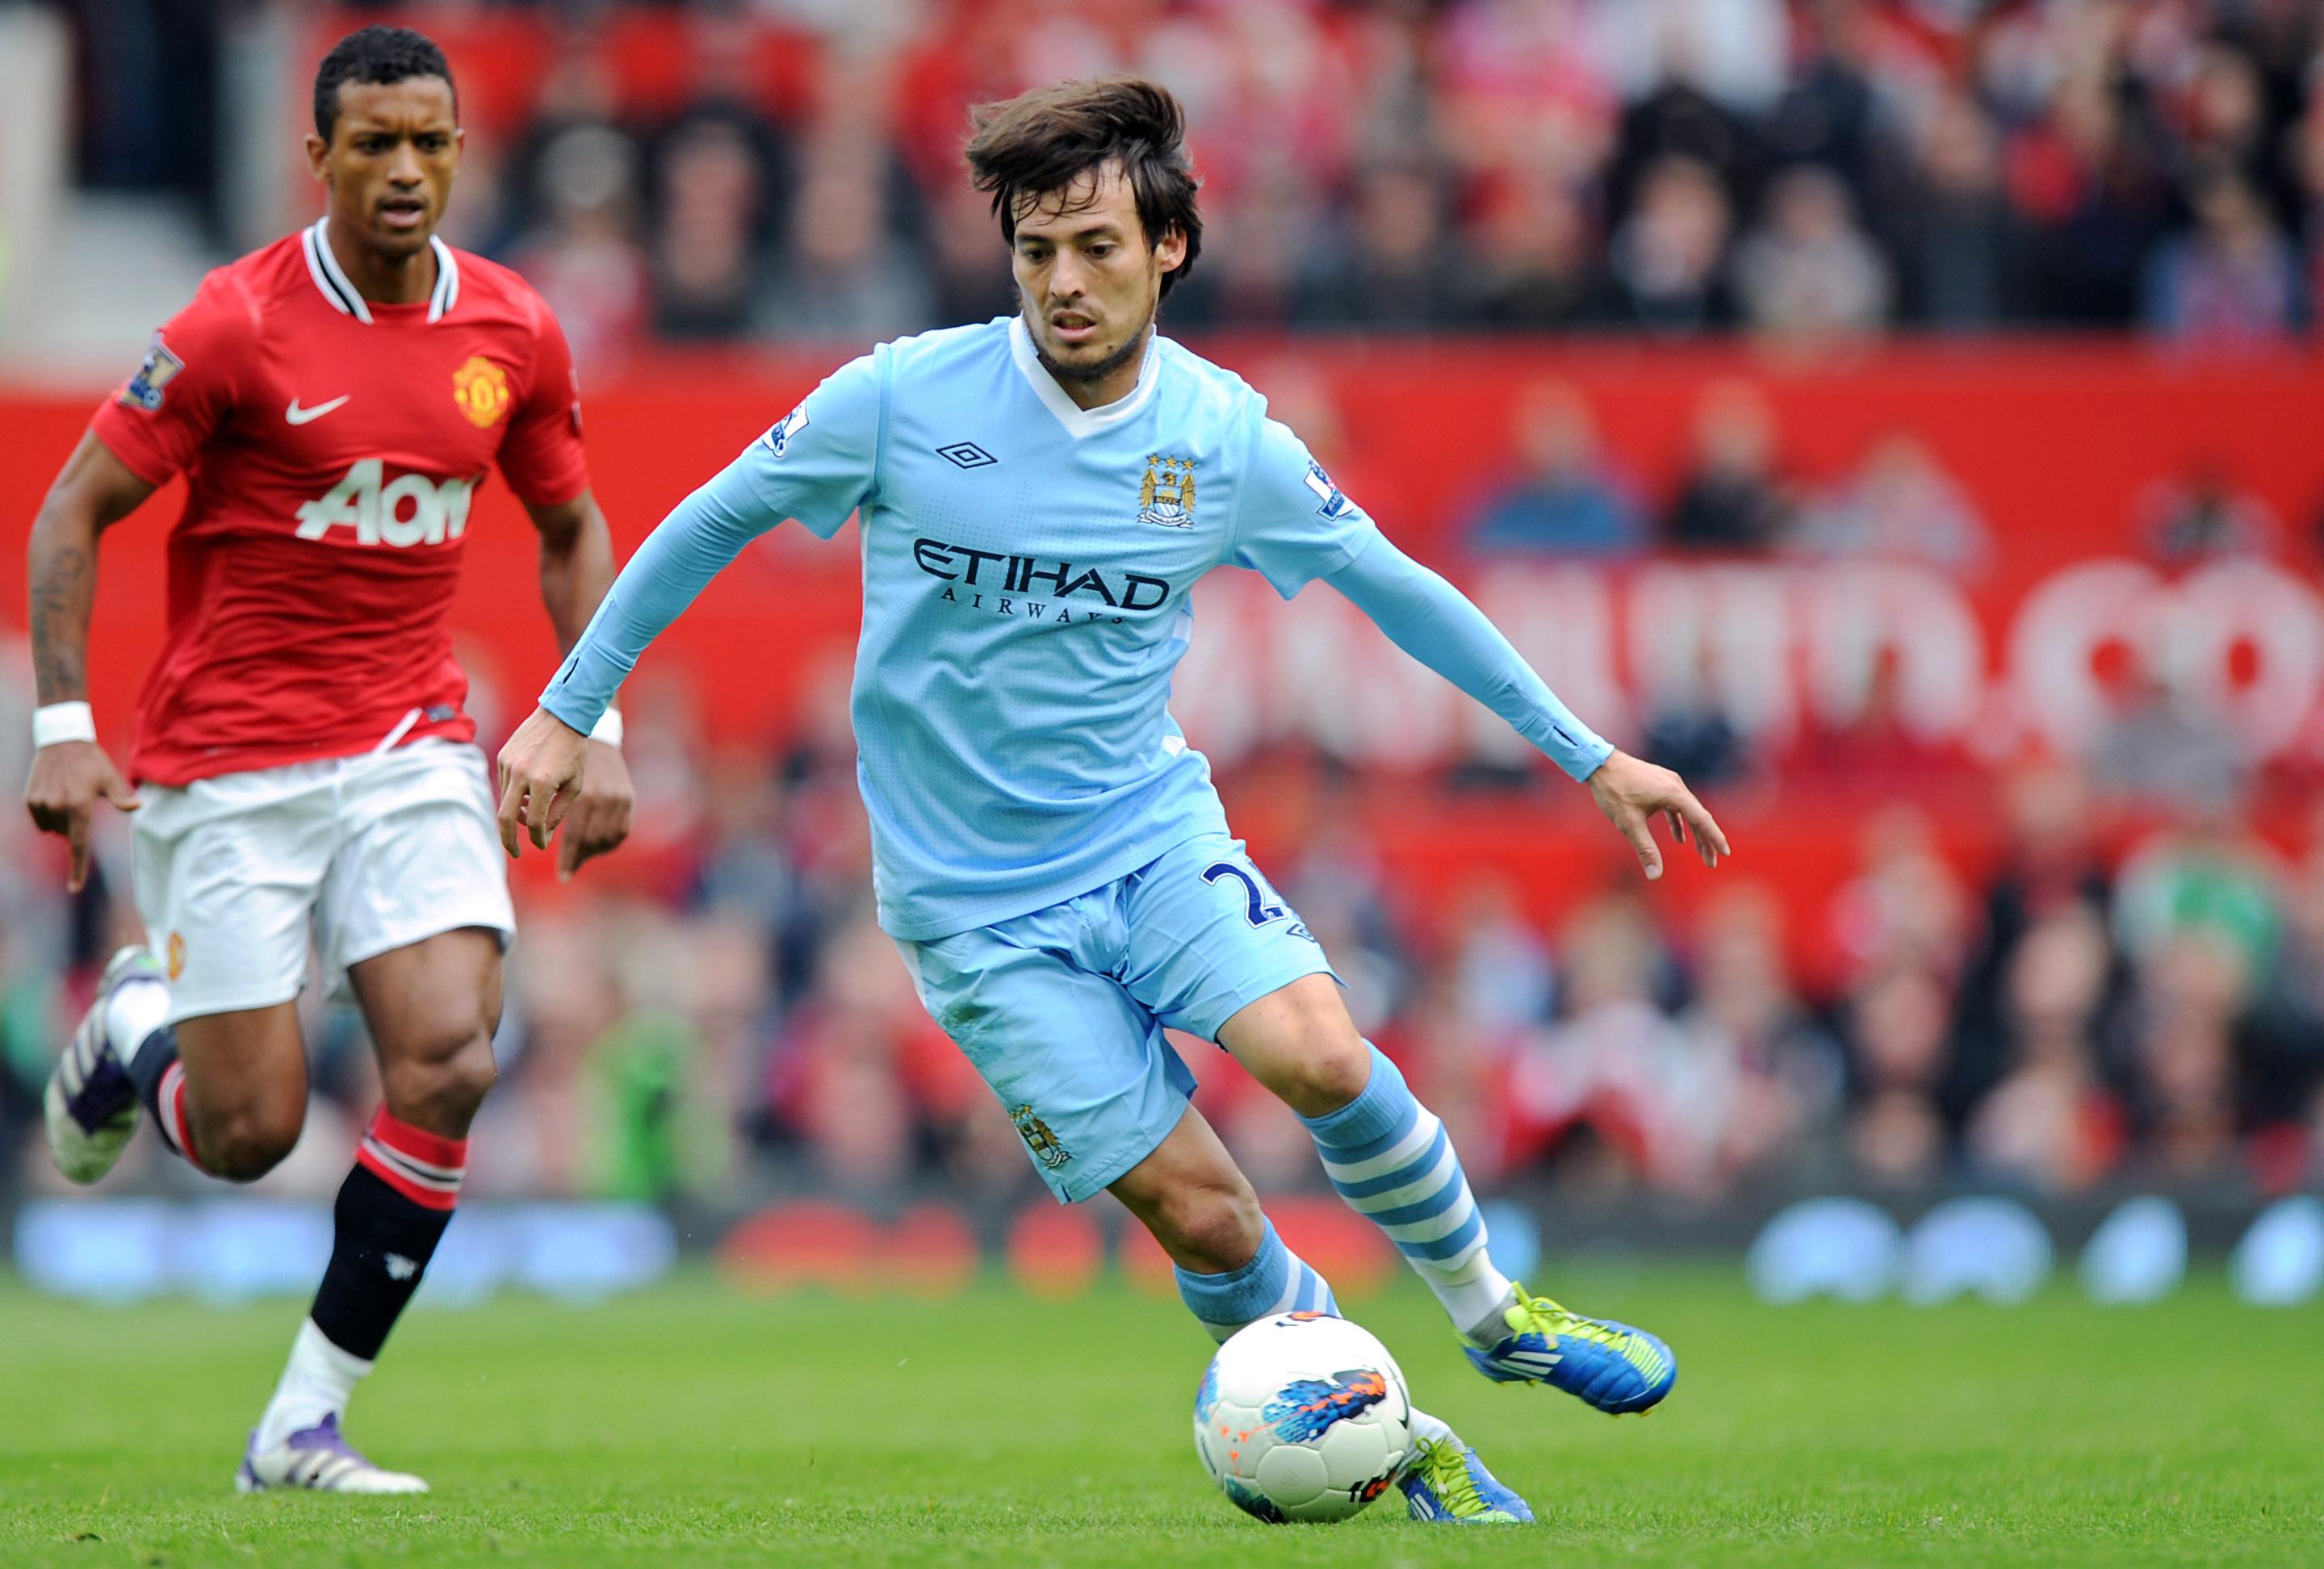 Manchester City - David Silva